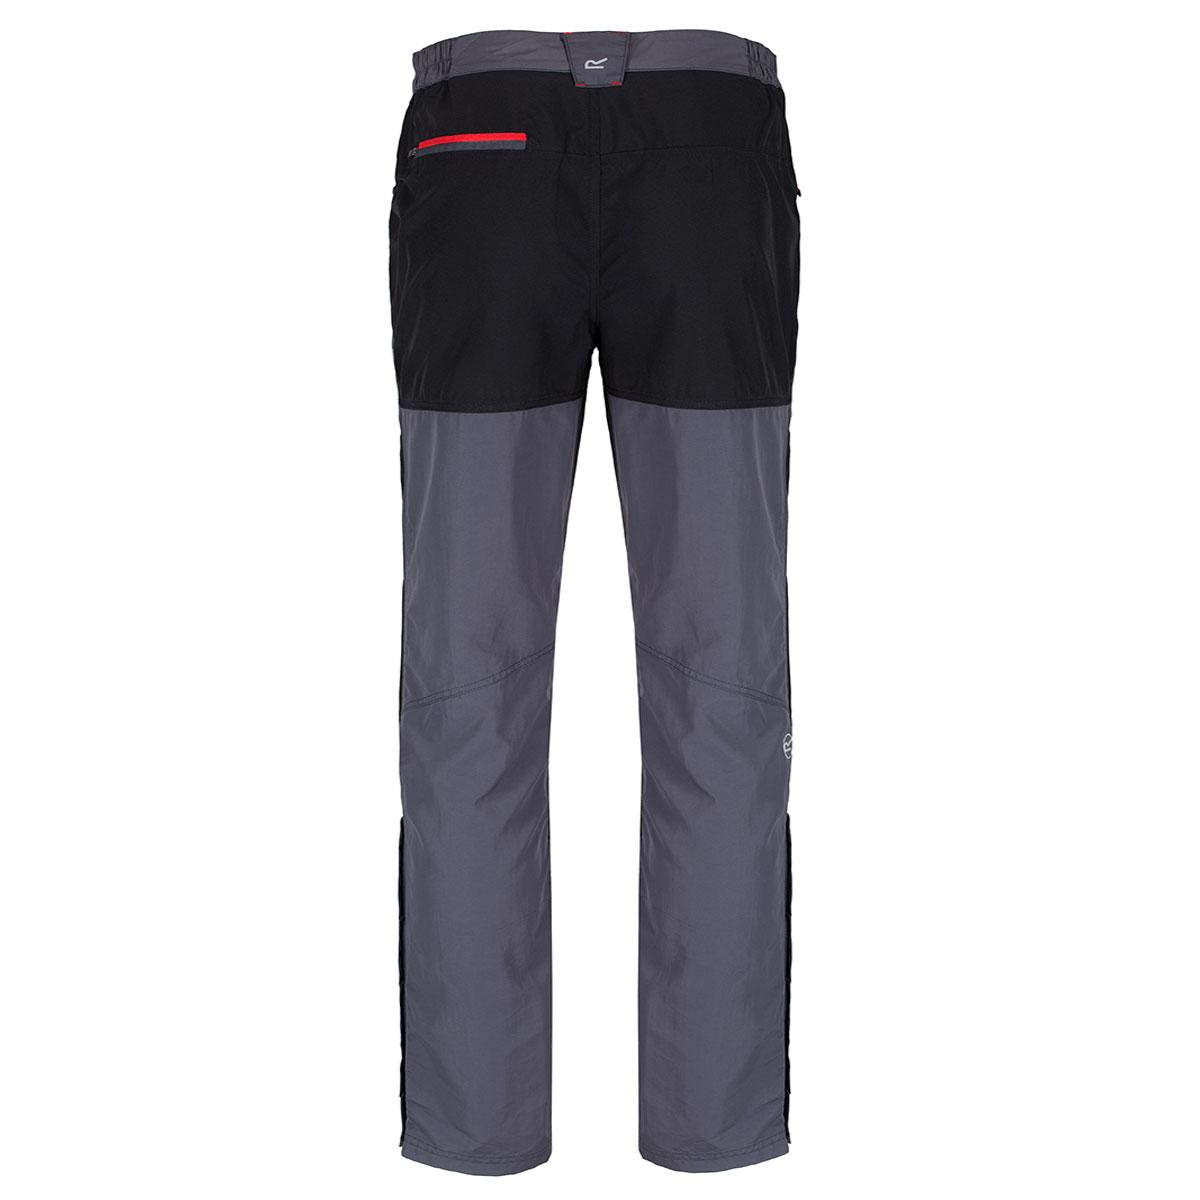 Regatta-Mens-Sungari-Lightweight-Water-Repellent-Stretch-Trousers-70-OFF-RRP thumbnail 7